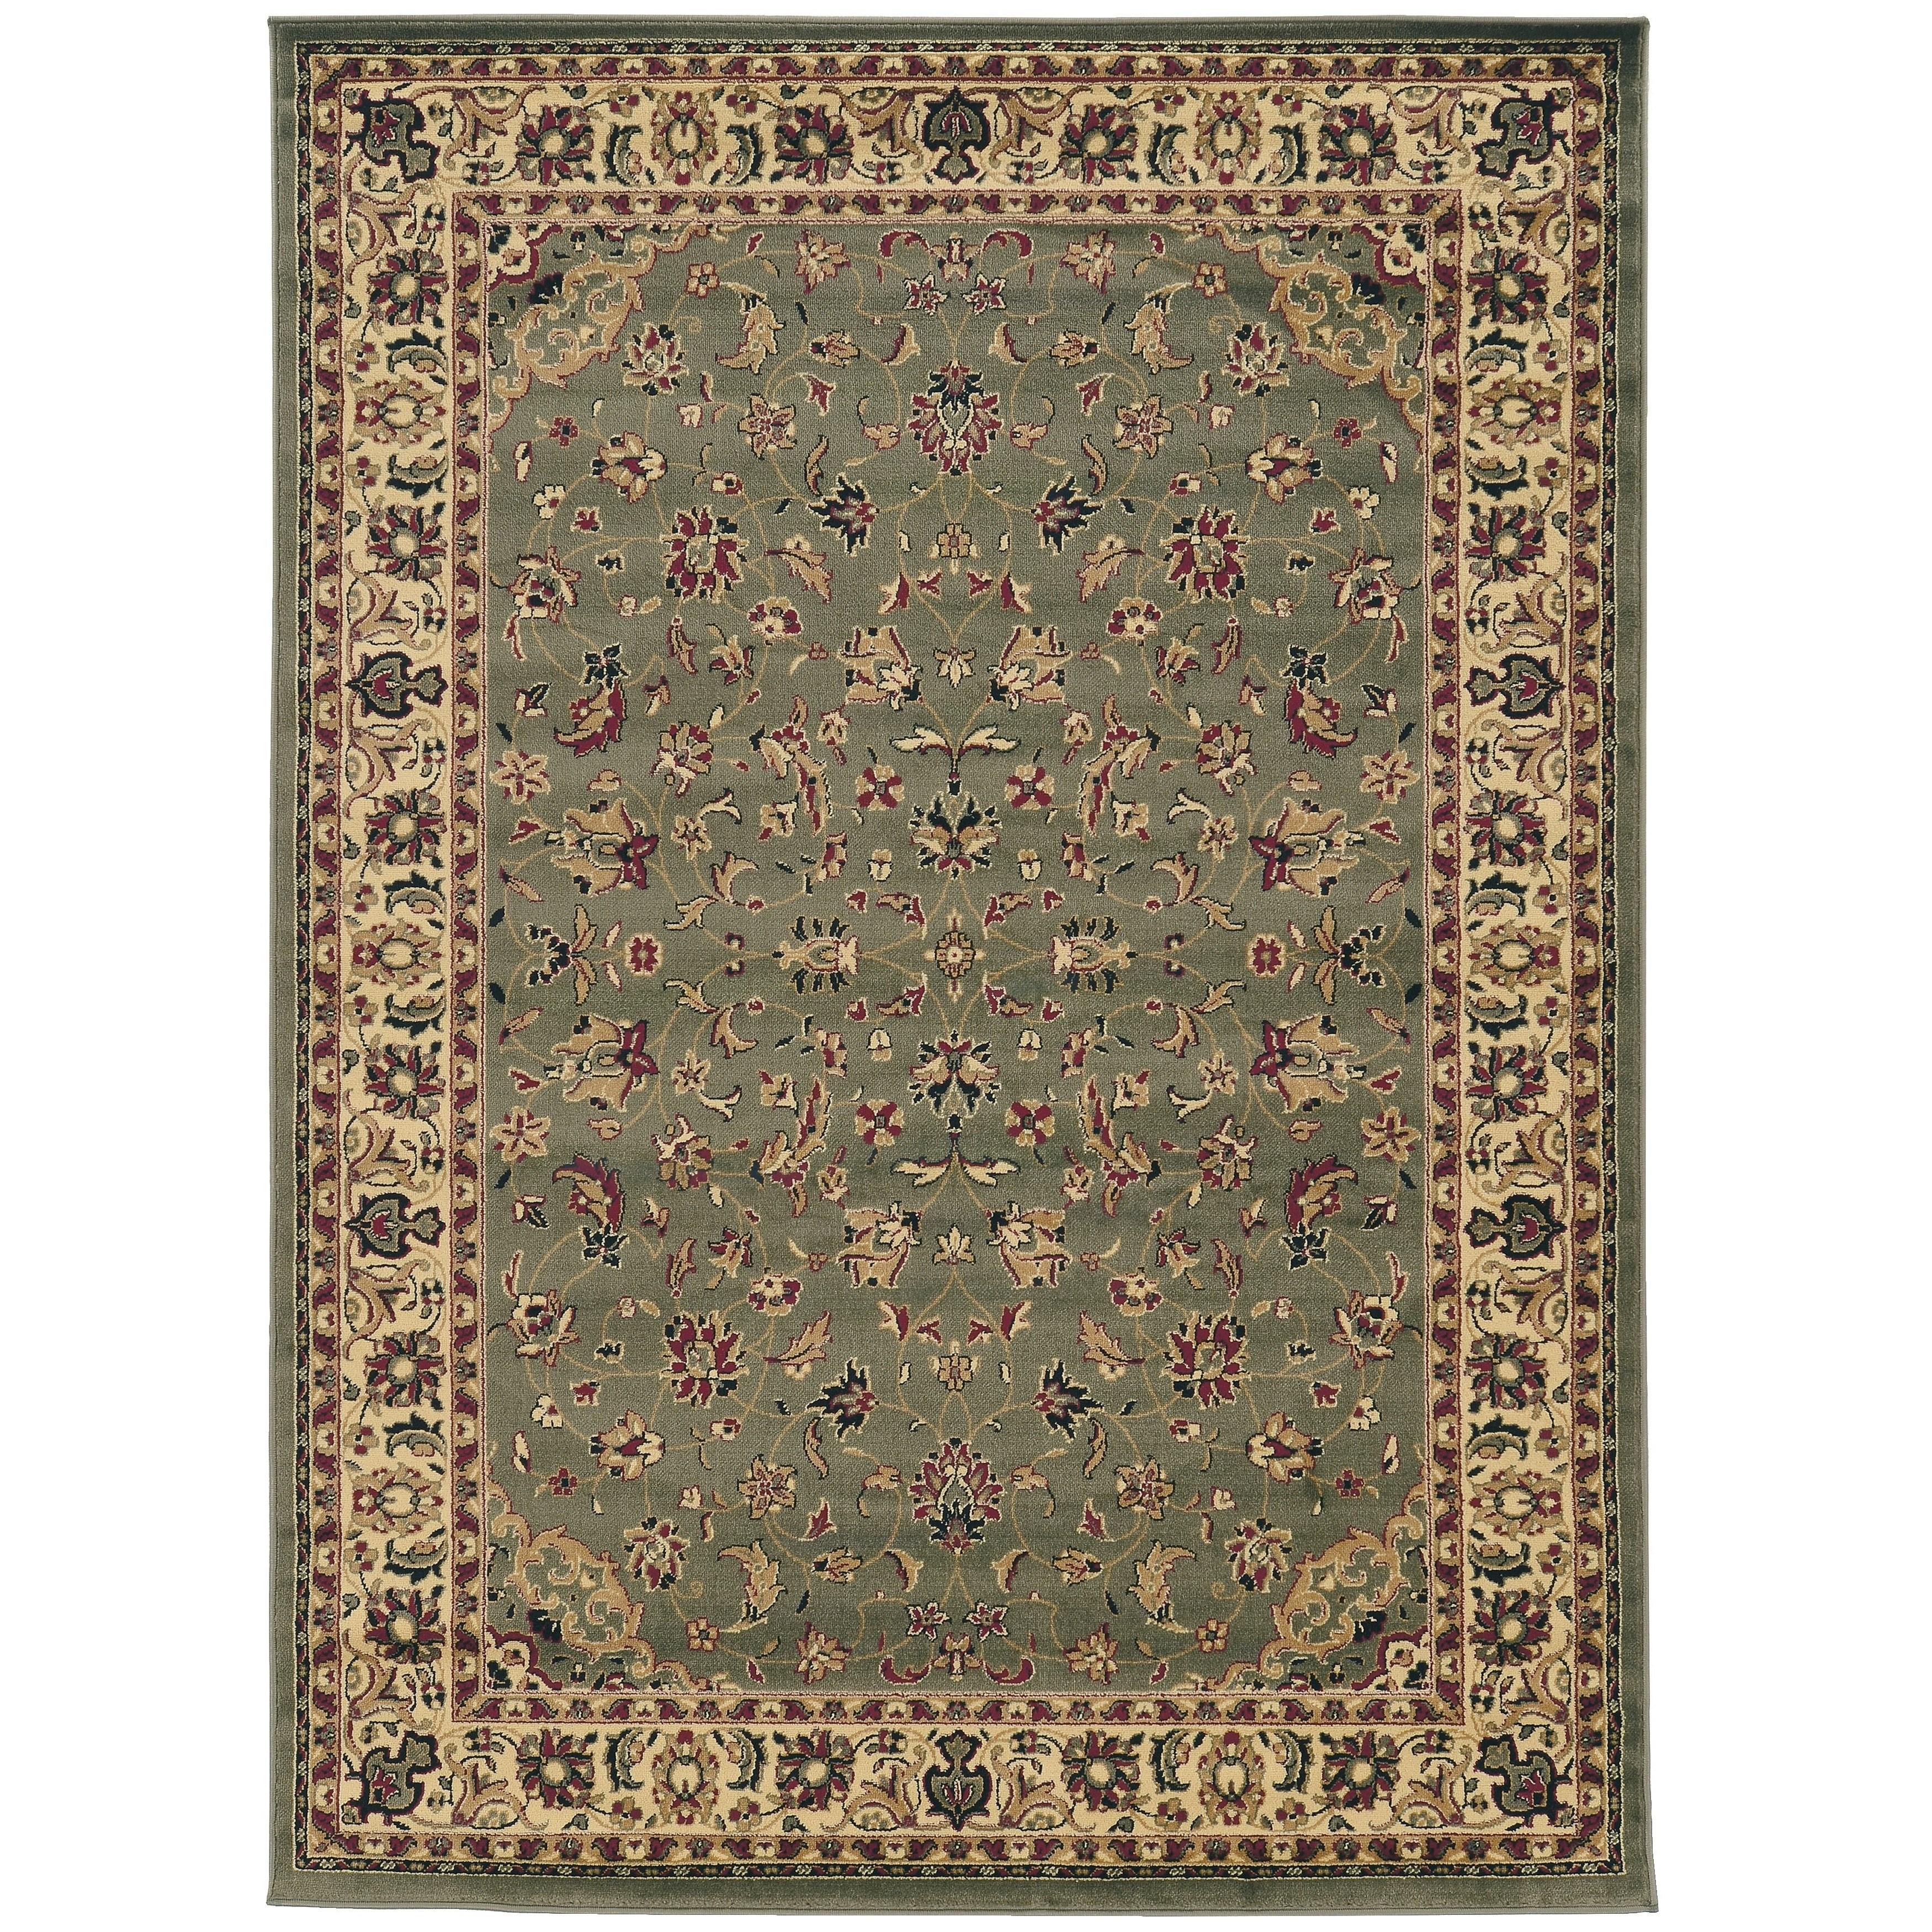 green rugs customer rating PHSTLXU